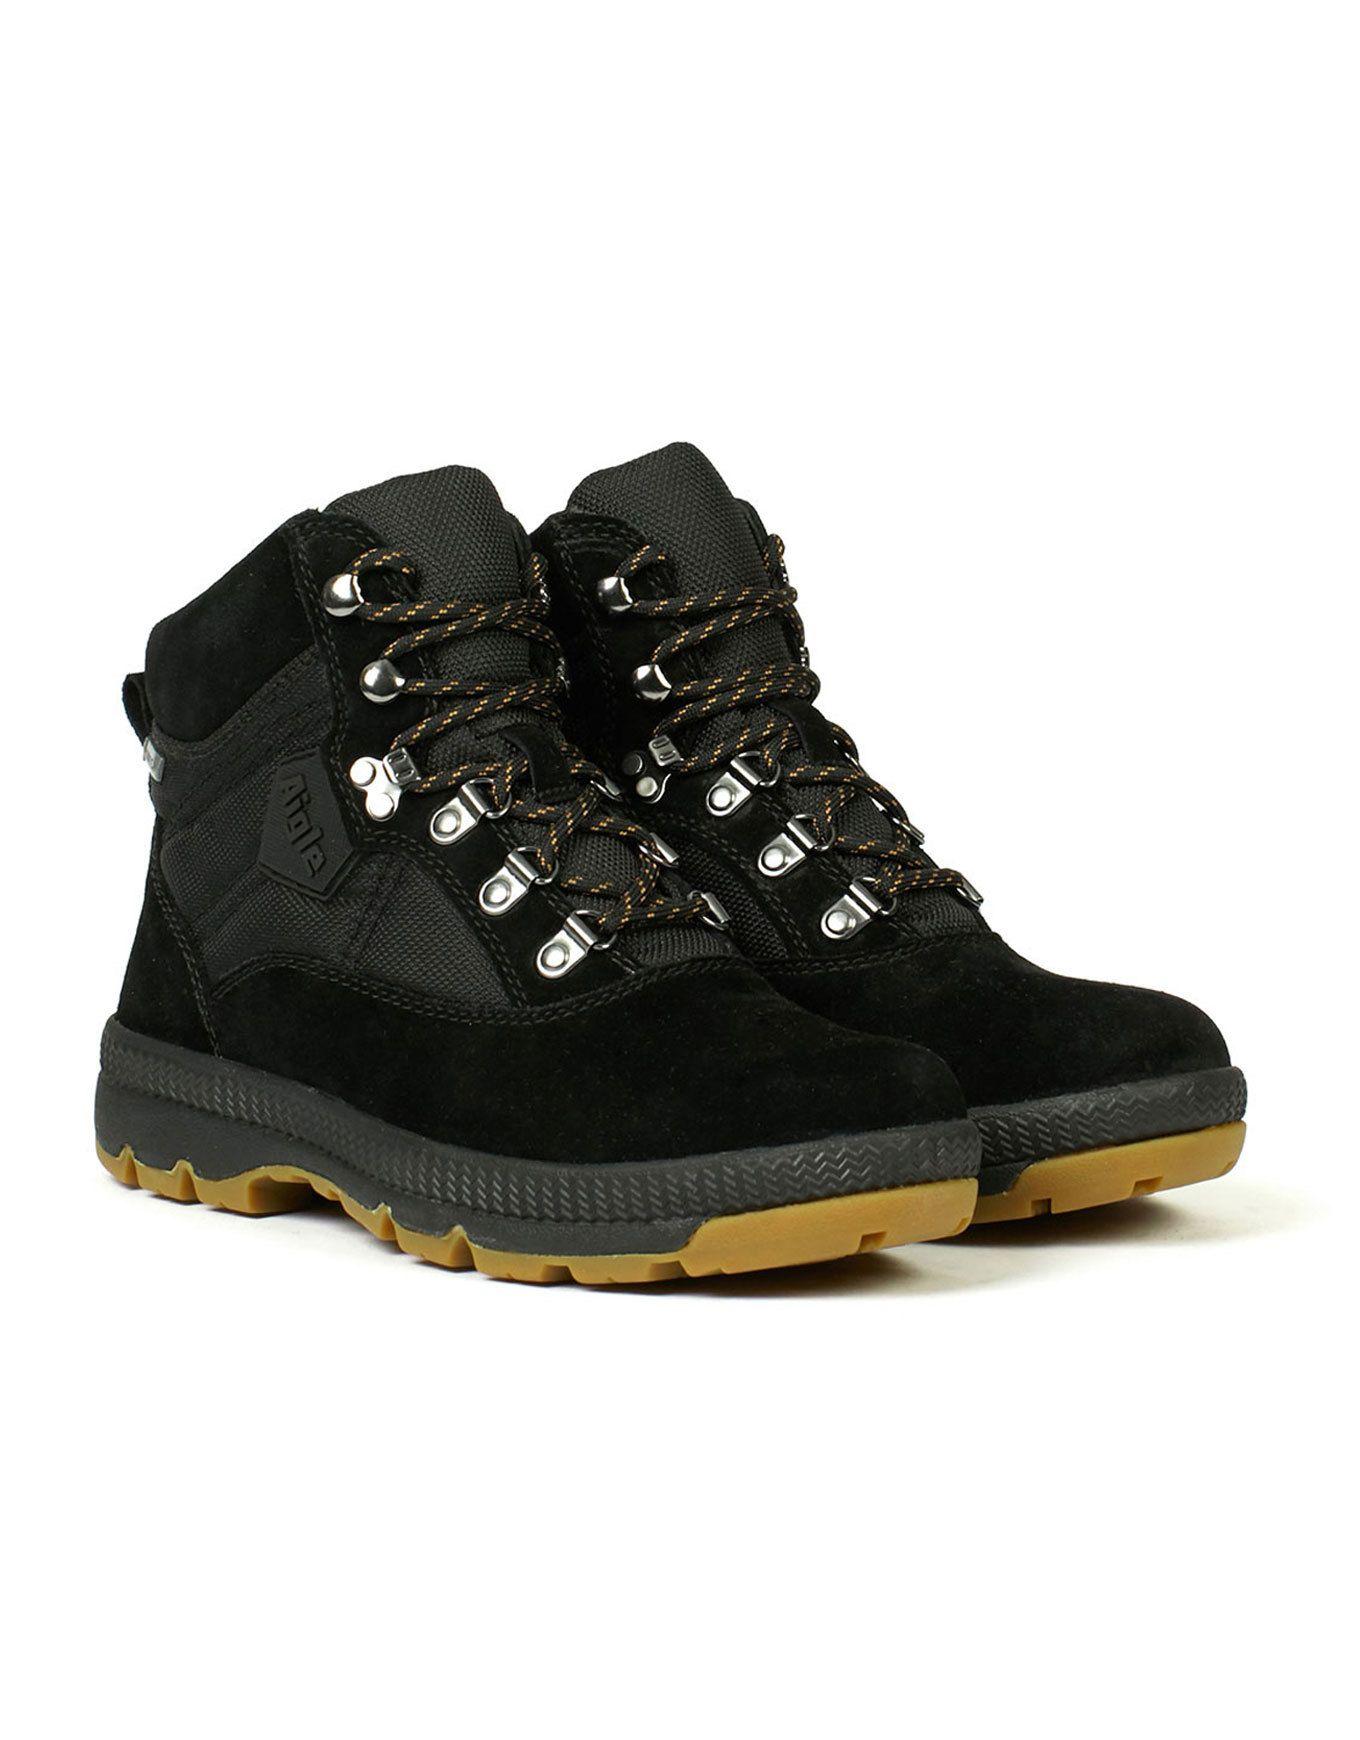 Randonnée AigleChaussures Gtx Snowleader Tl Hik Black W 3 Femme f7gvyIb6Ym